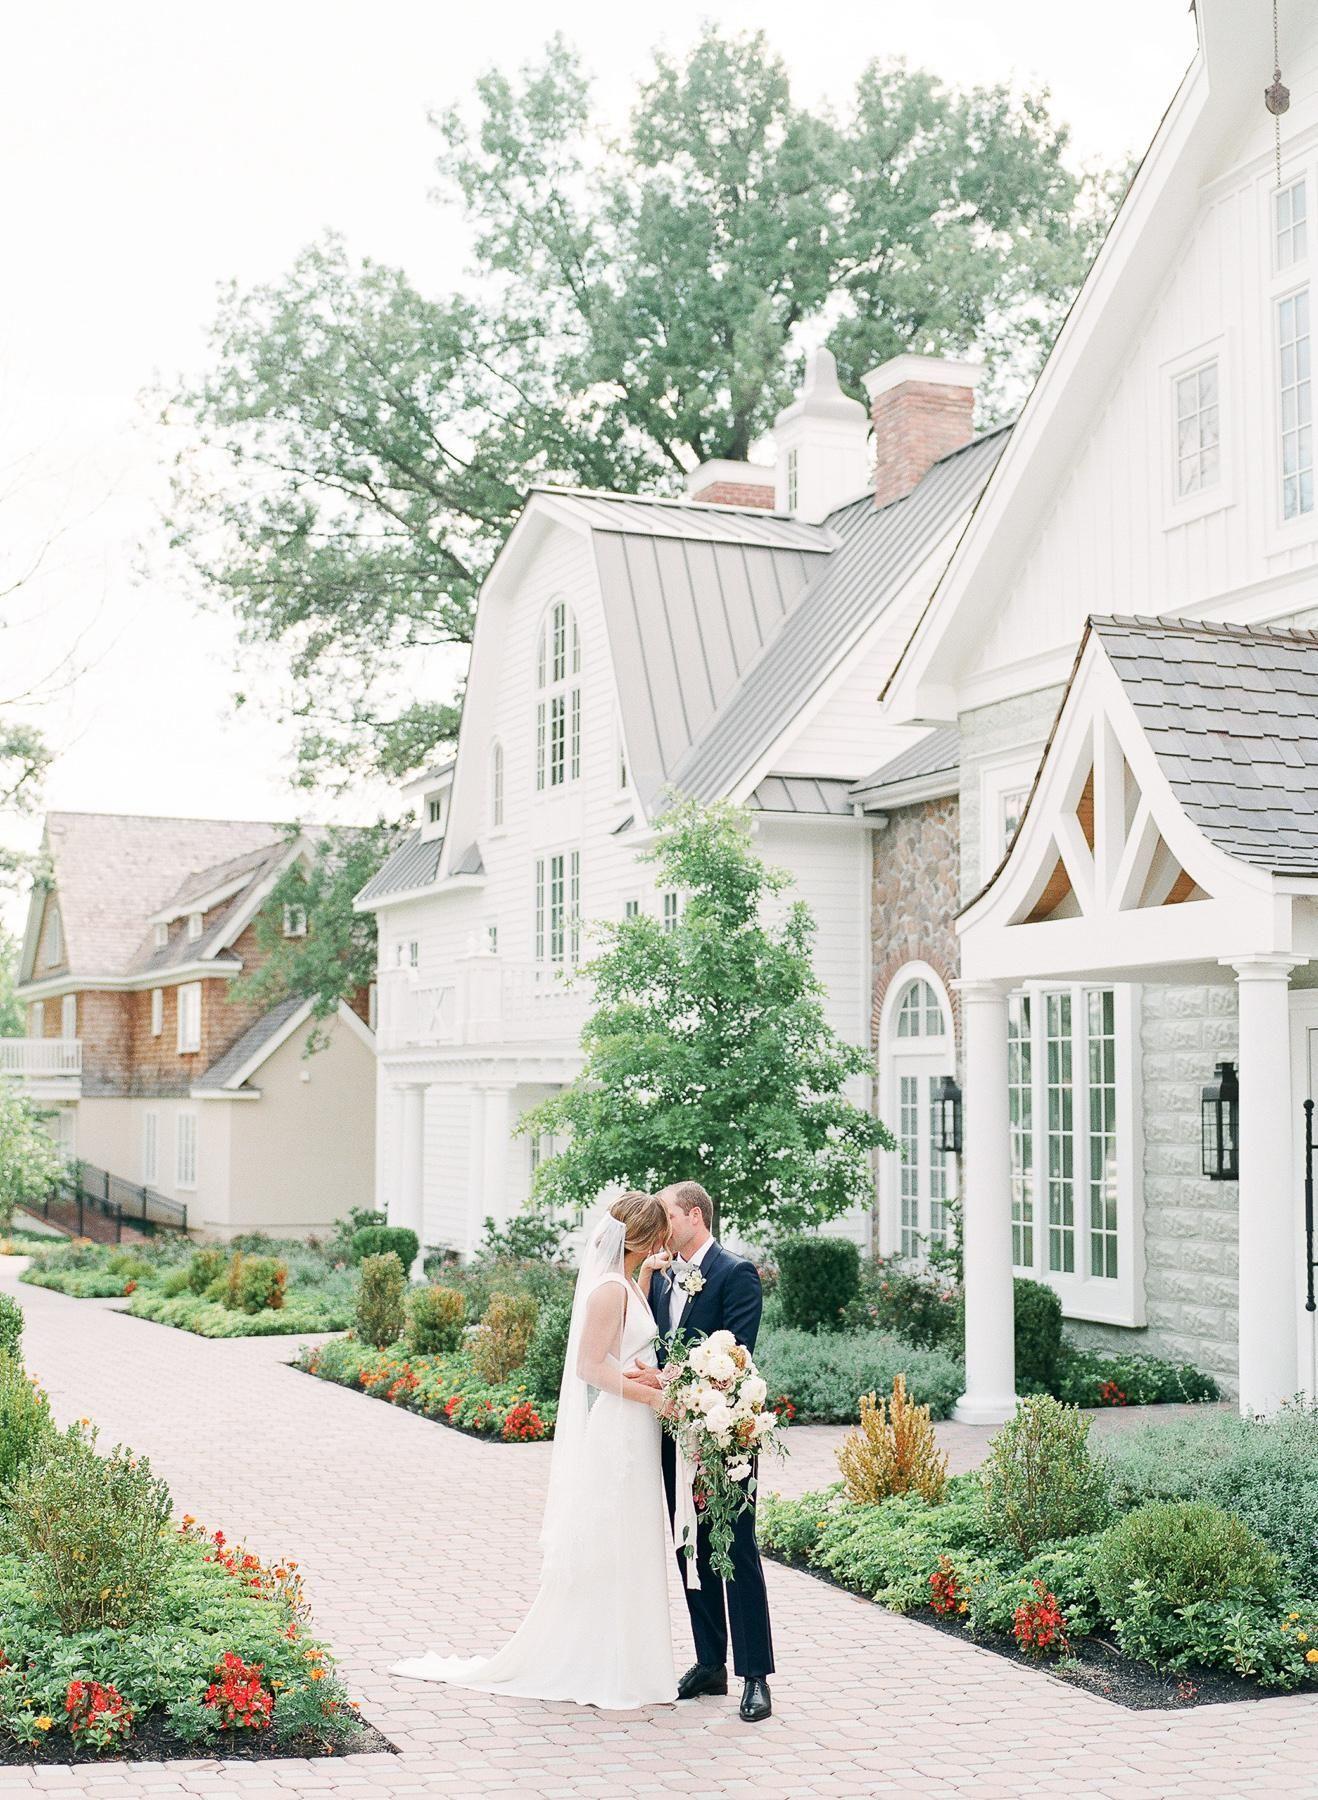 Top Wedding Venues in New Jersey Top Wedding Venues in